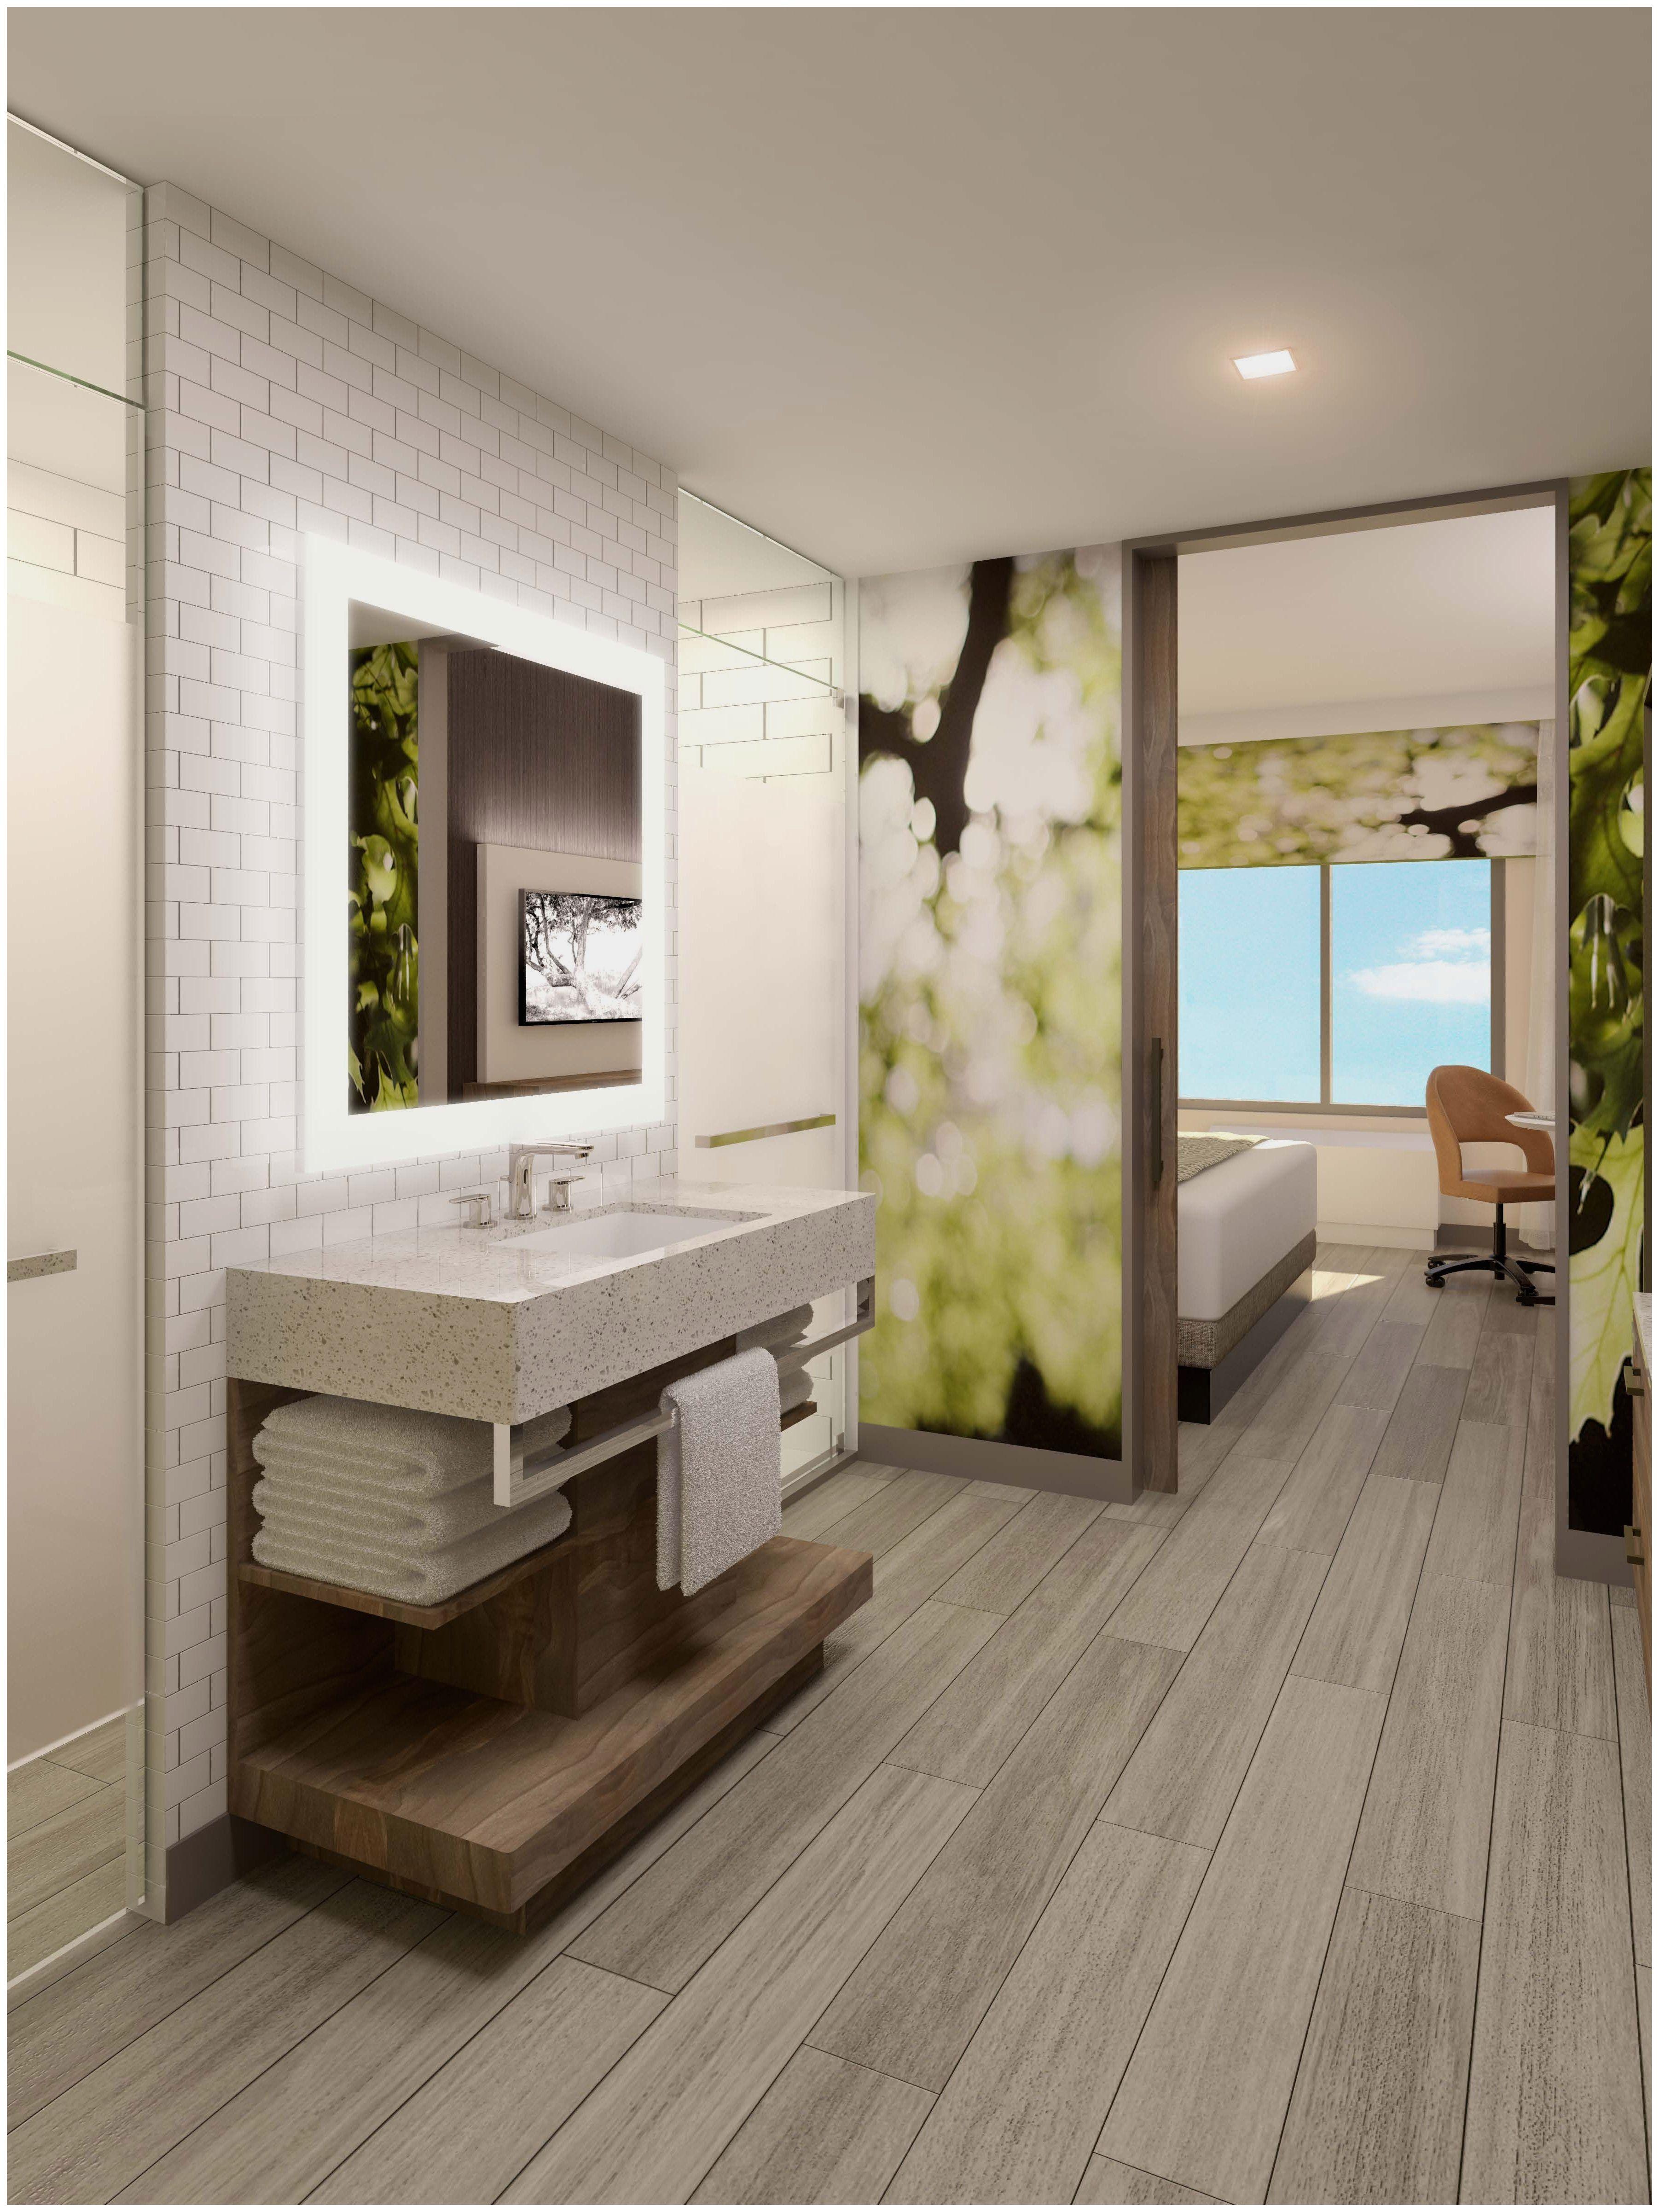 20 Inspirational Used Bathroom Vanity for Sale Near Me Image ...